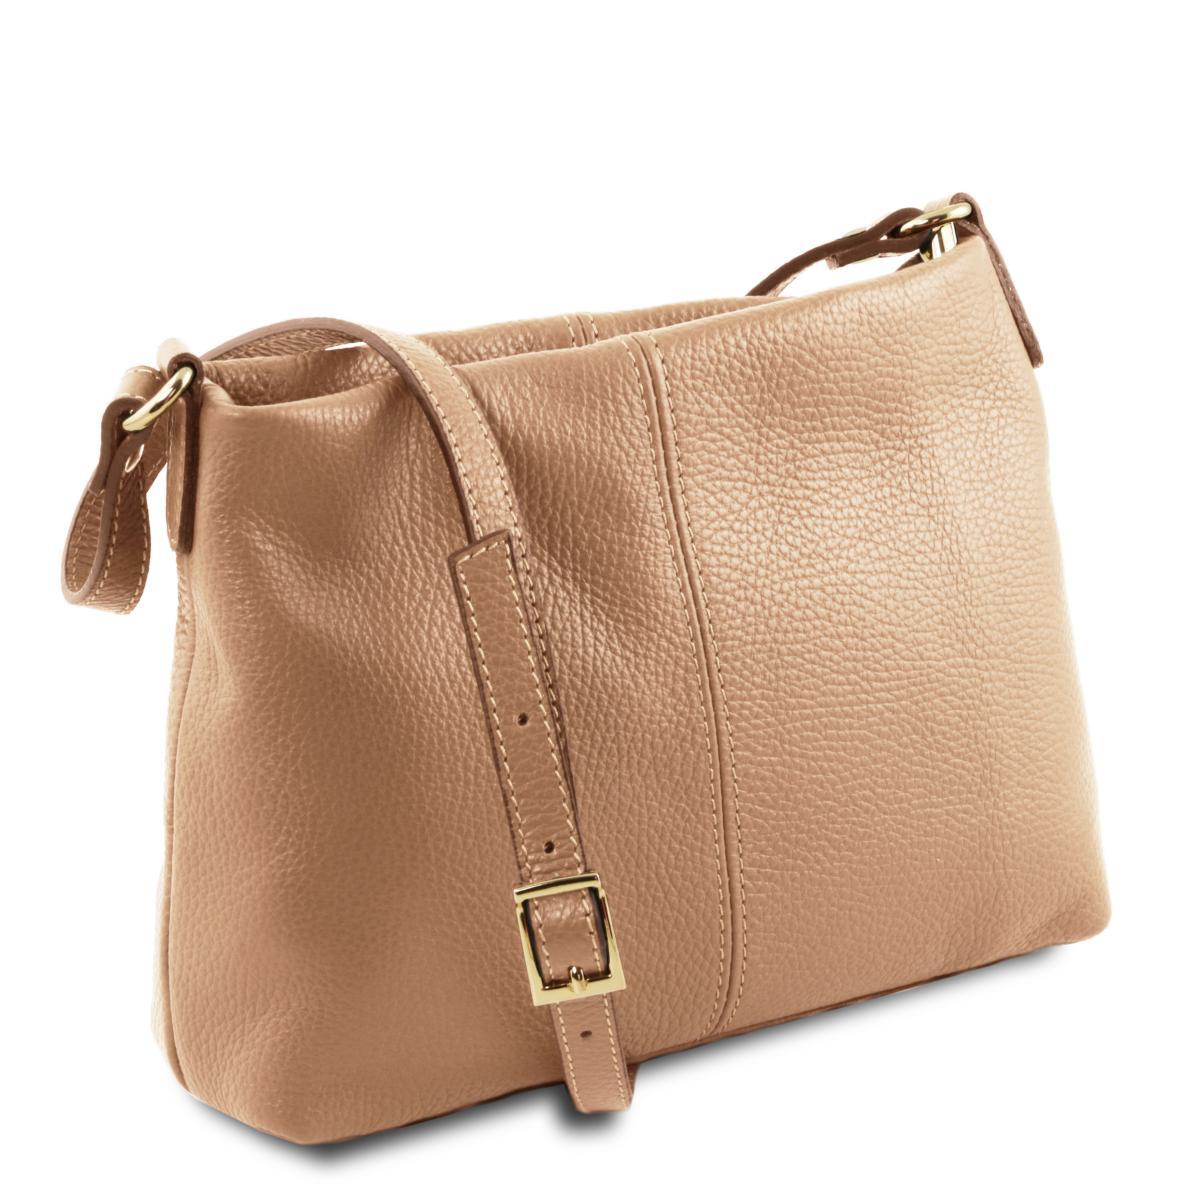 Sac Bandoulière Cuir Souple Femme Beige - Tuscany Leather -